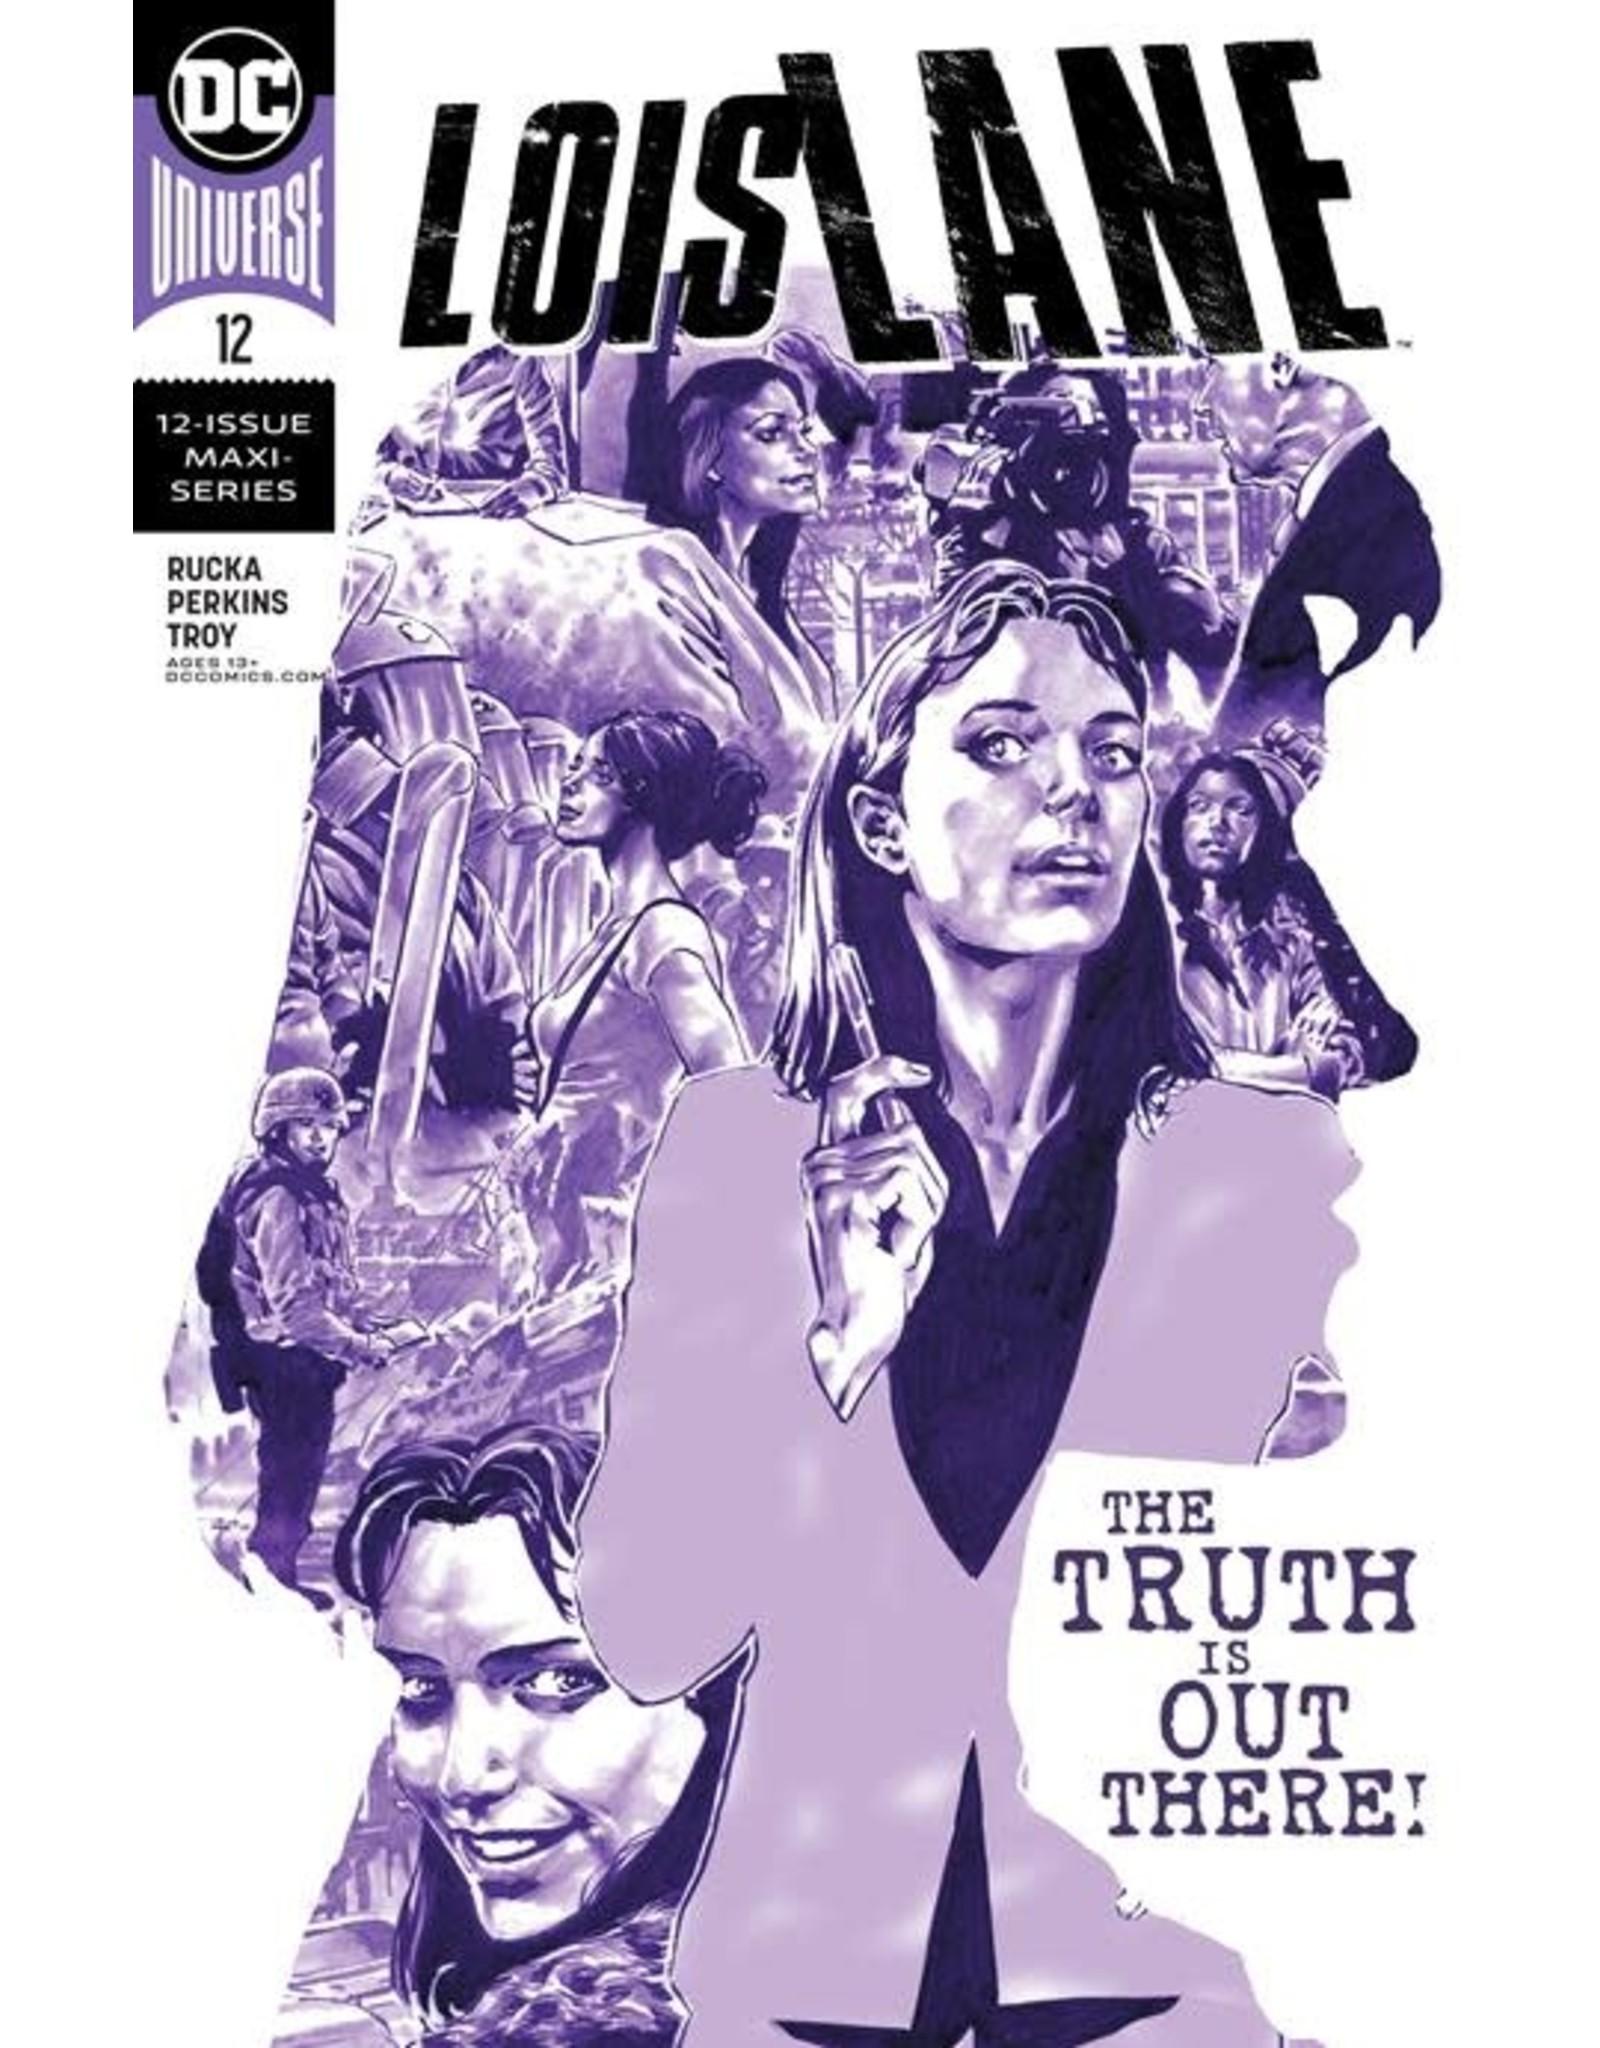 DC COMICS LOIS LANE #12 (OF 12)